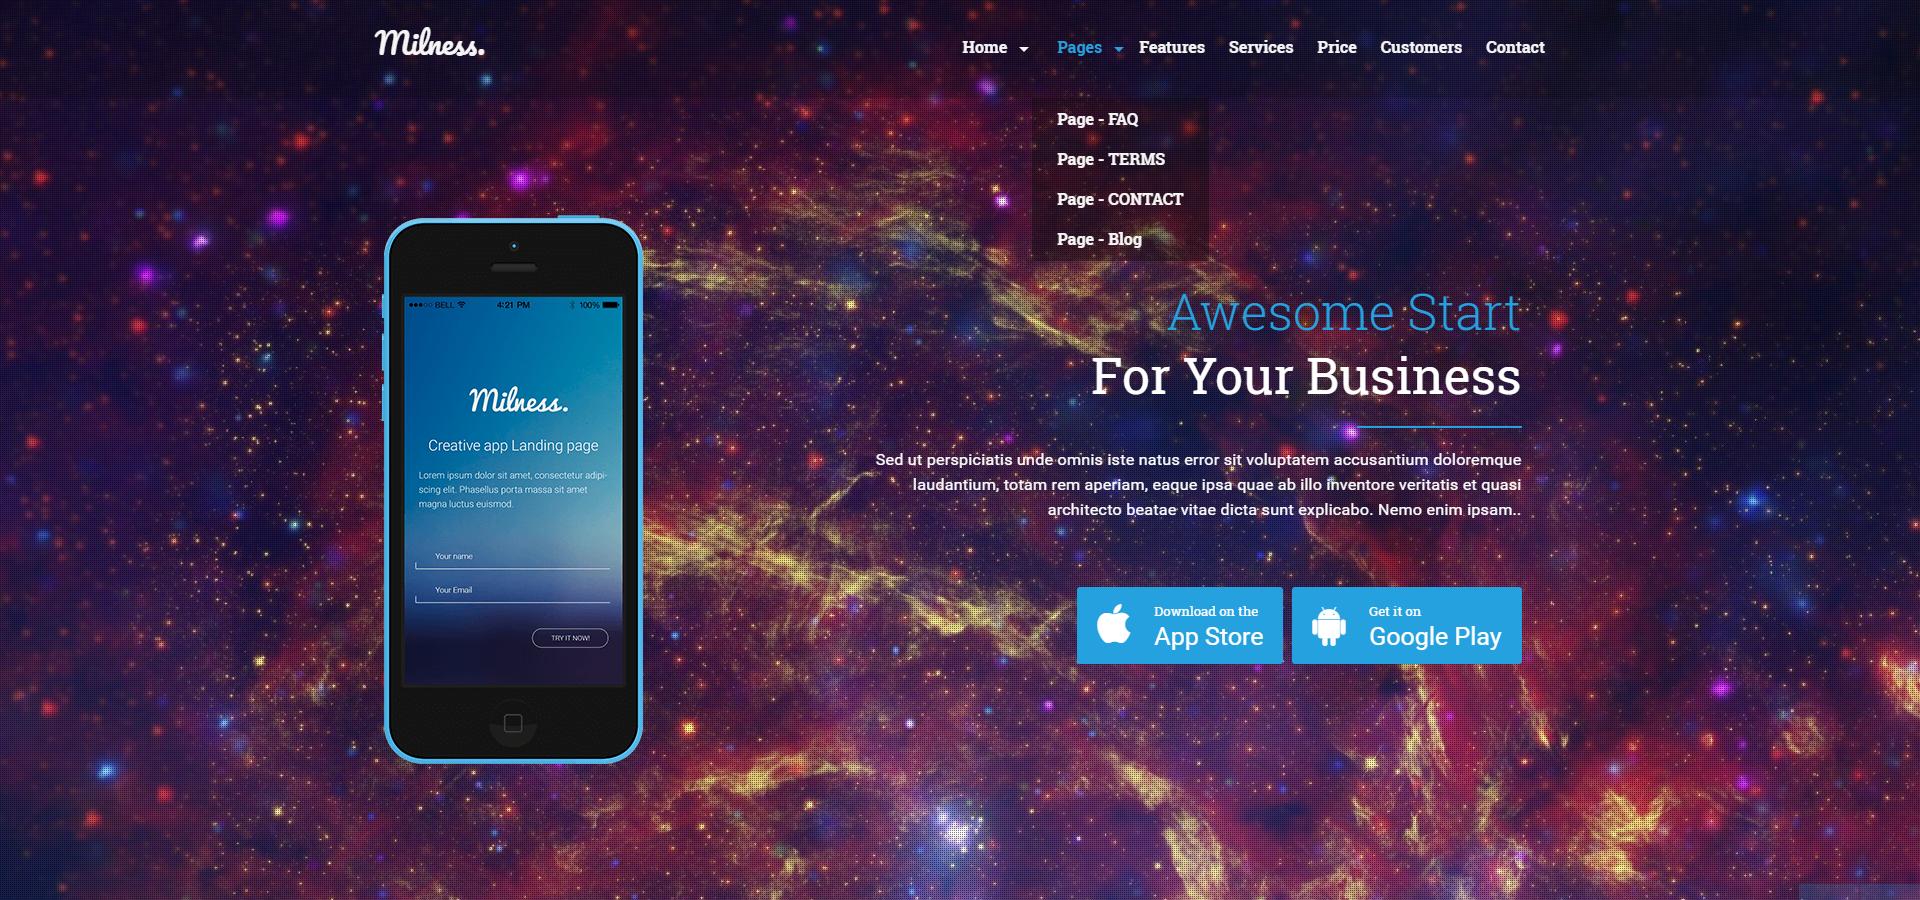 Milness Showcase Mobile App Website Template 65448